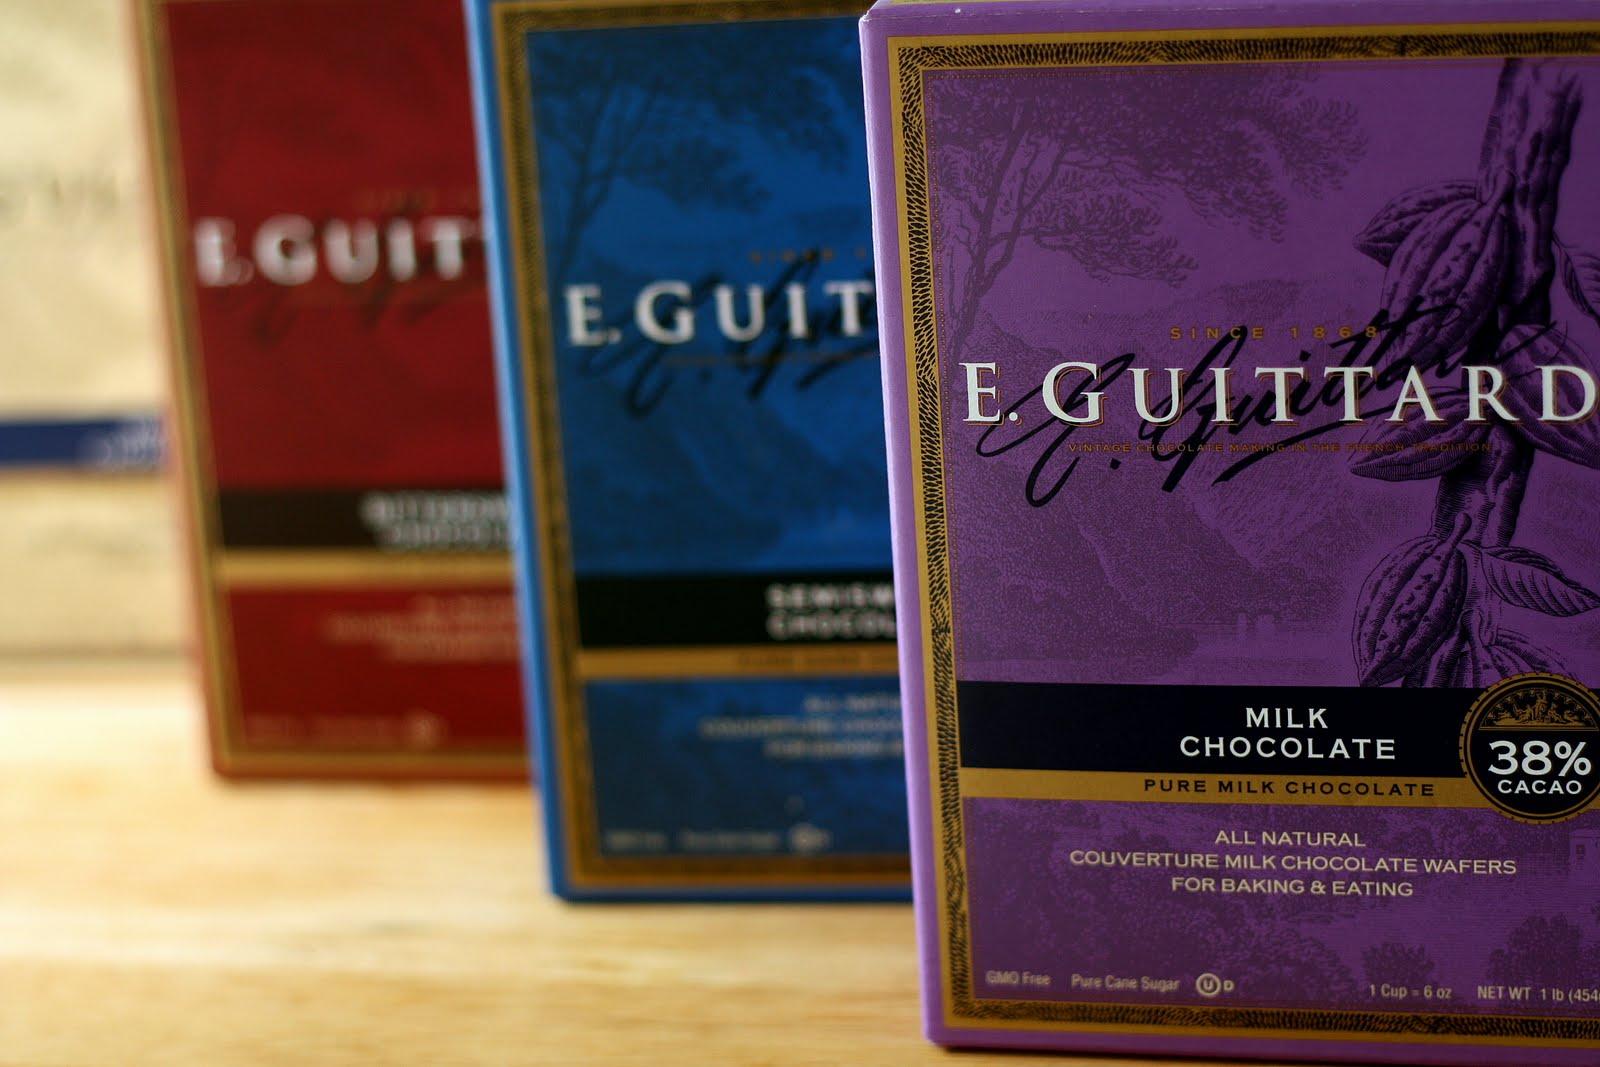 Guittard Milk Chocolate Apeels How Long Do The Ylast